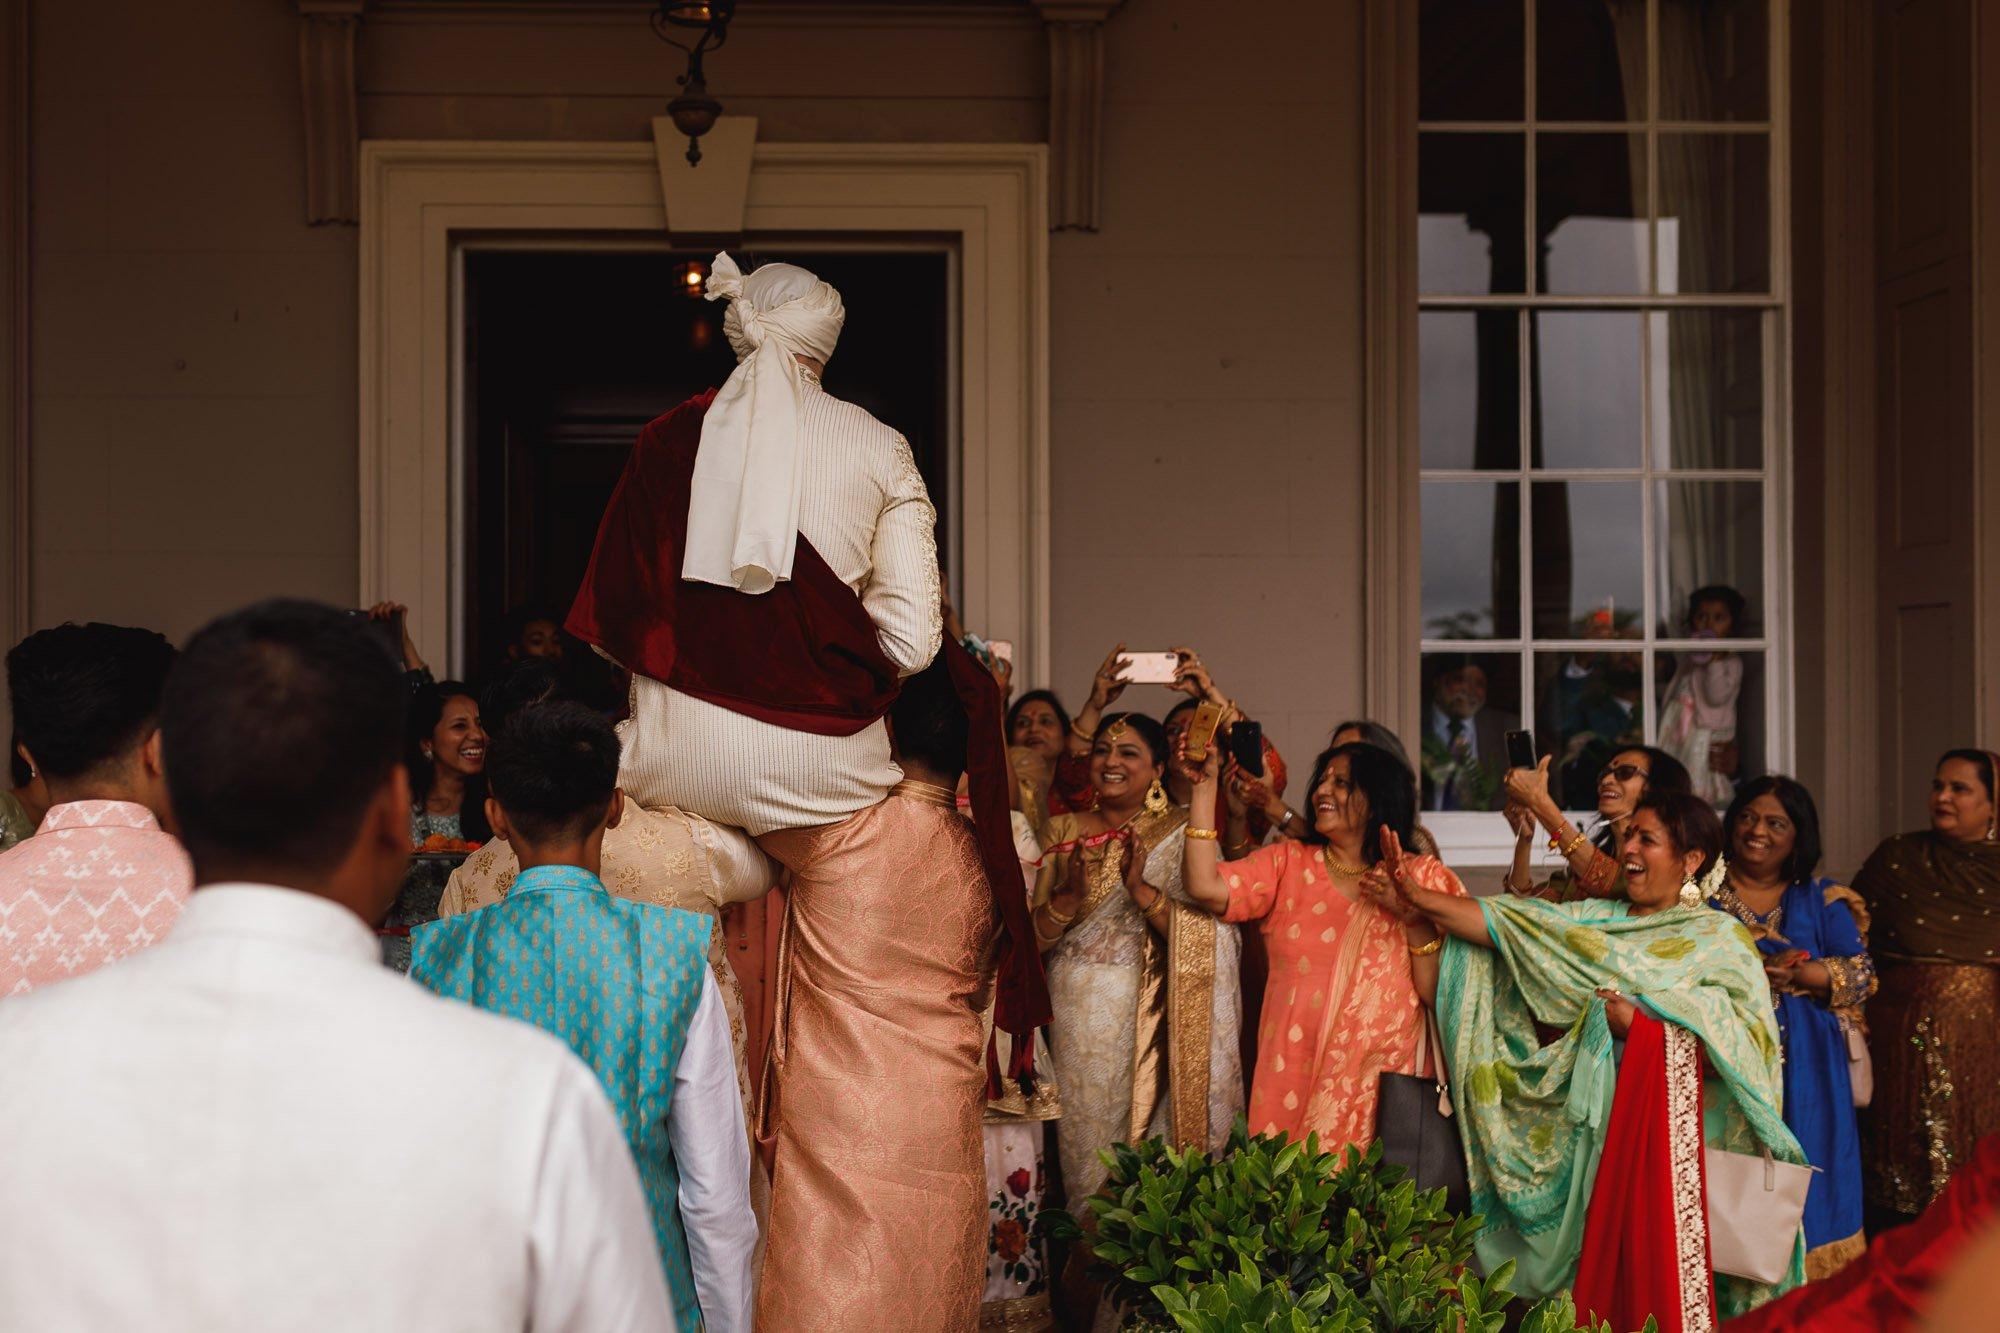 De Vere Wokefield Estate, Asian wedding photographer, grooms entrance, grooms arrival